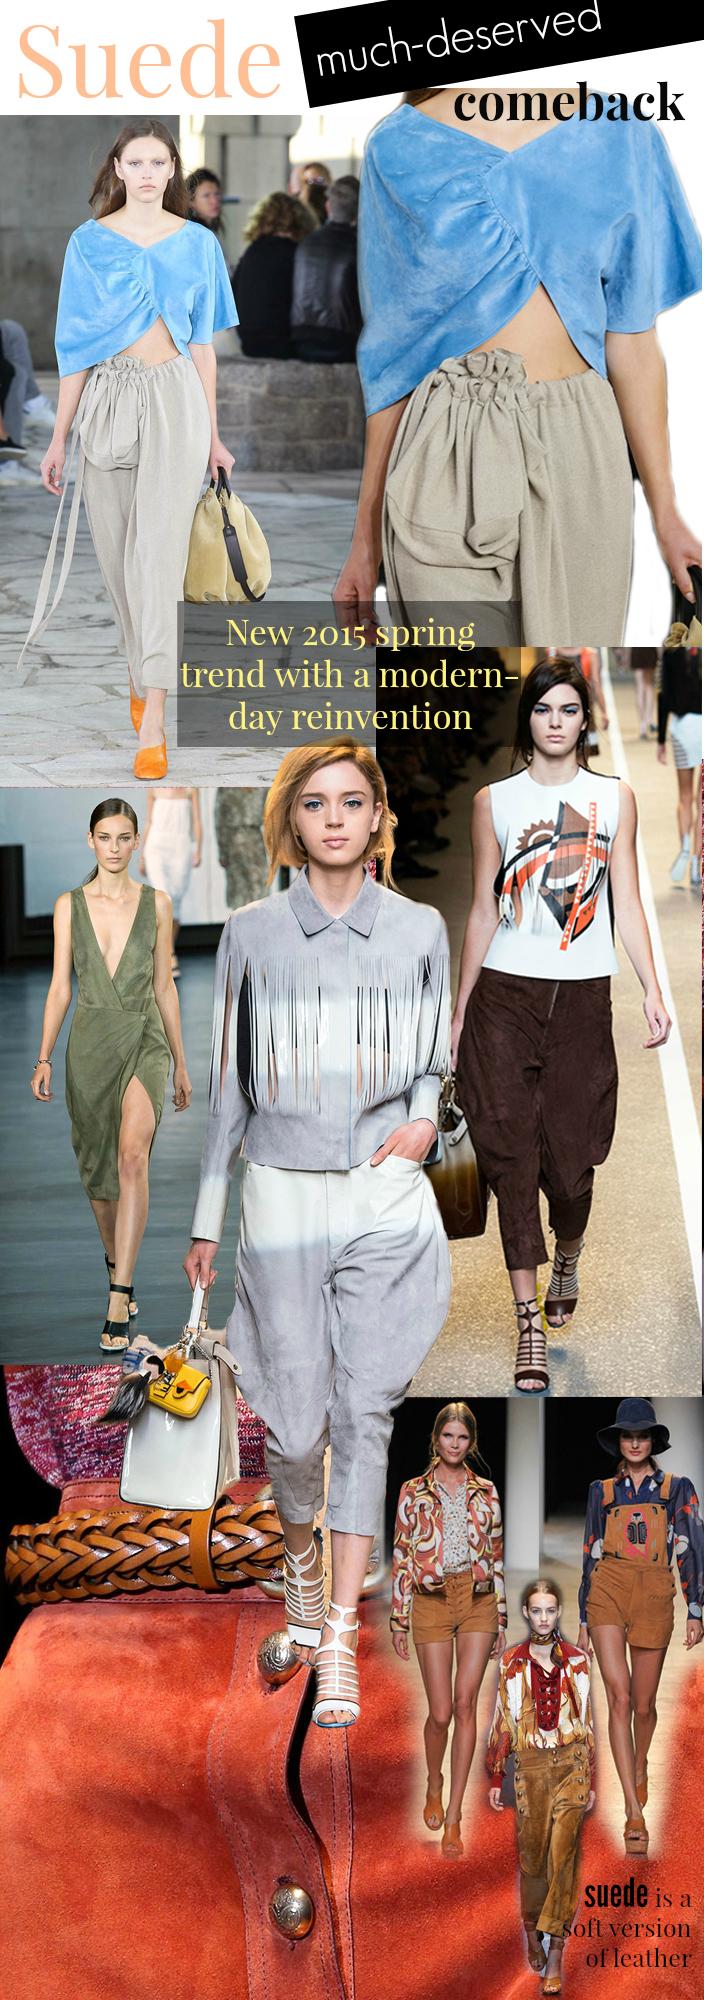 Suede 2015 Trend